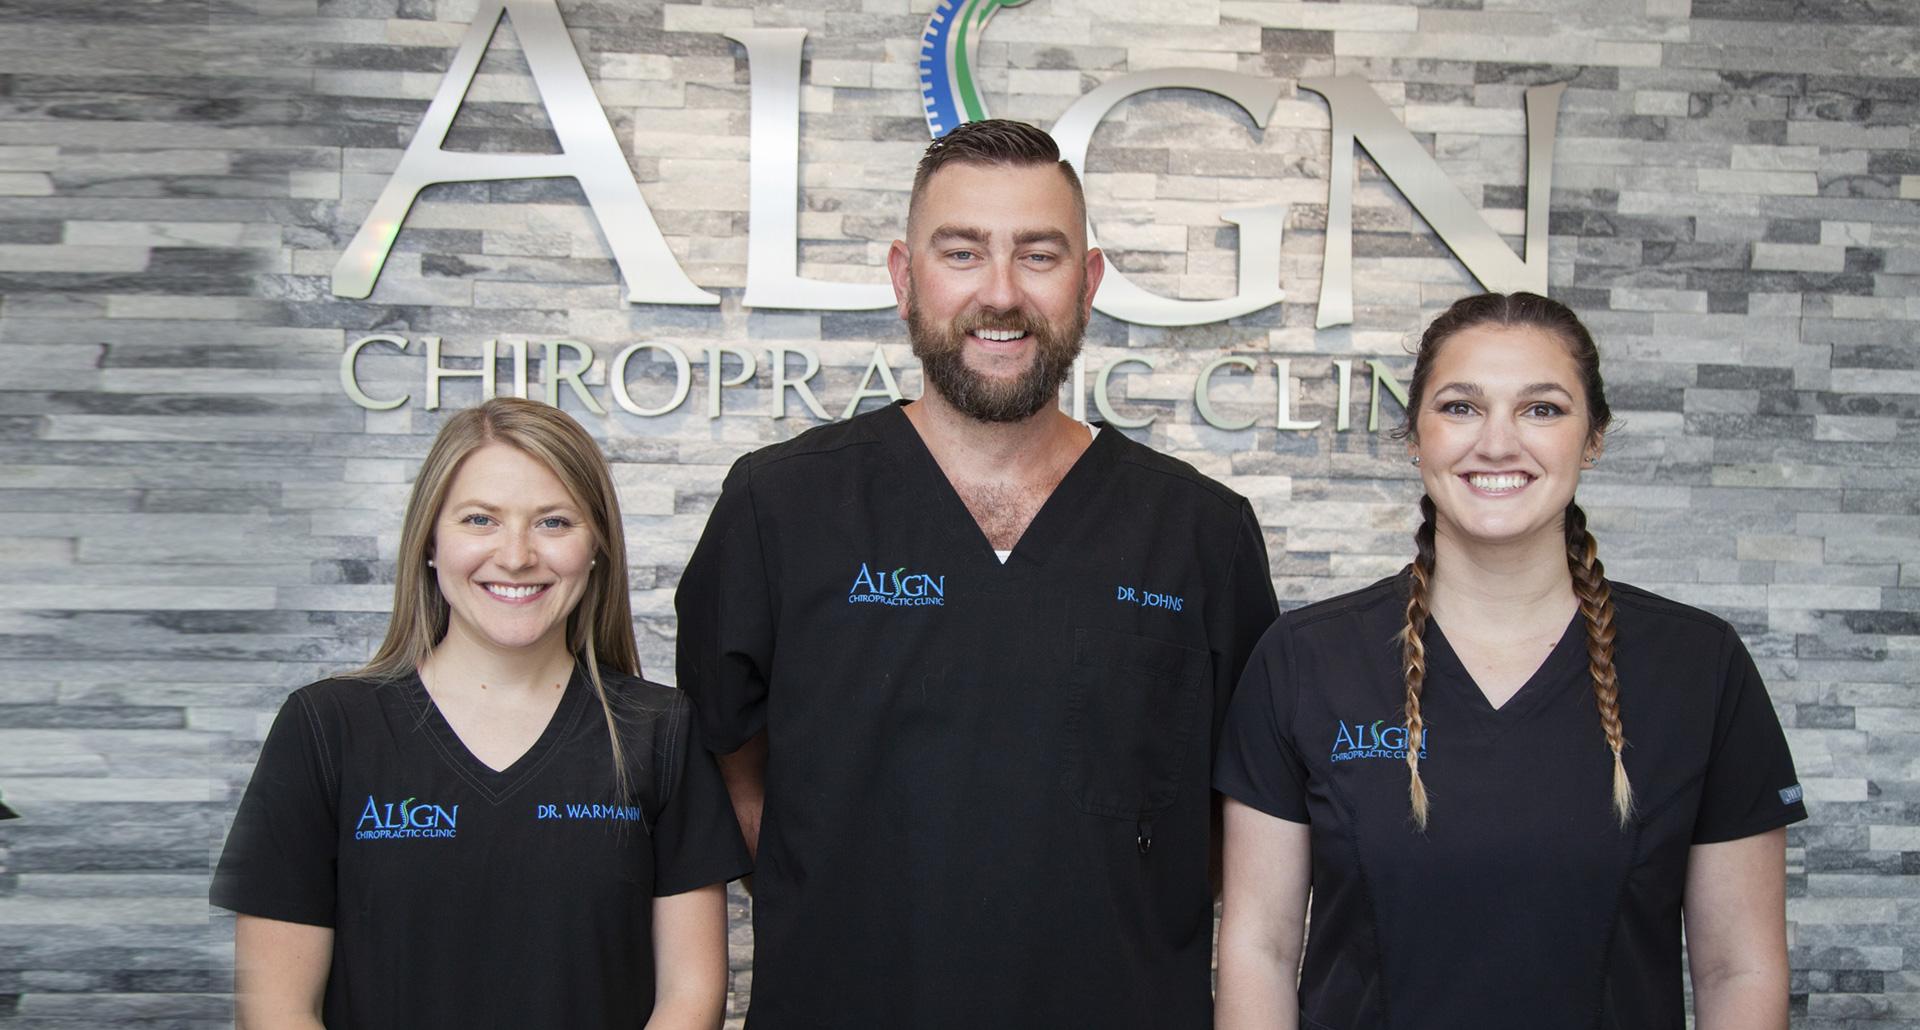 Align Chiropractic Clinic team